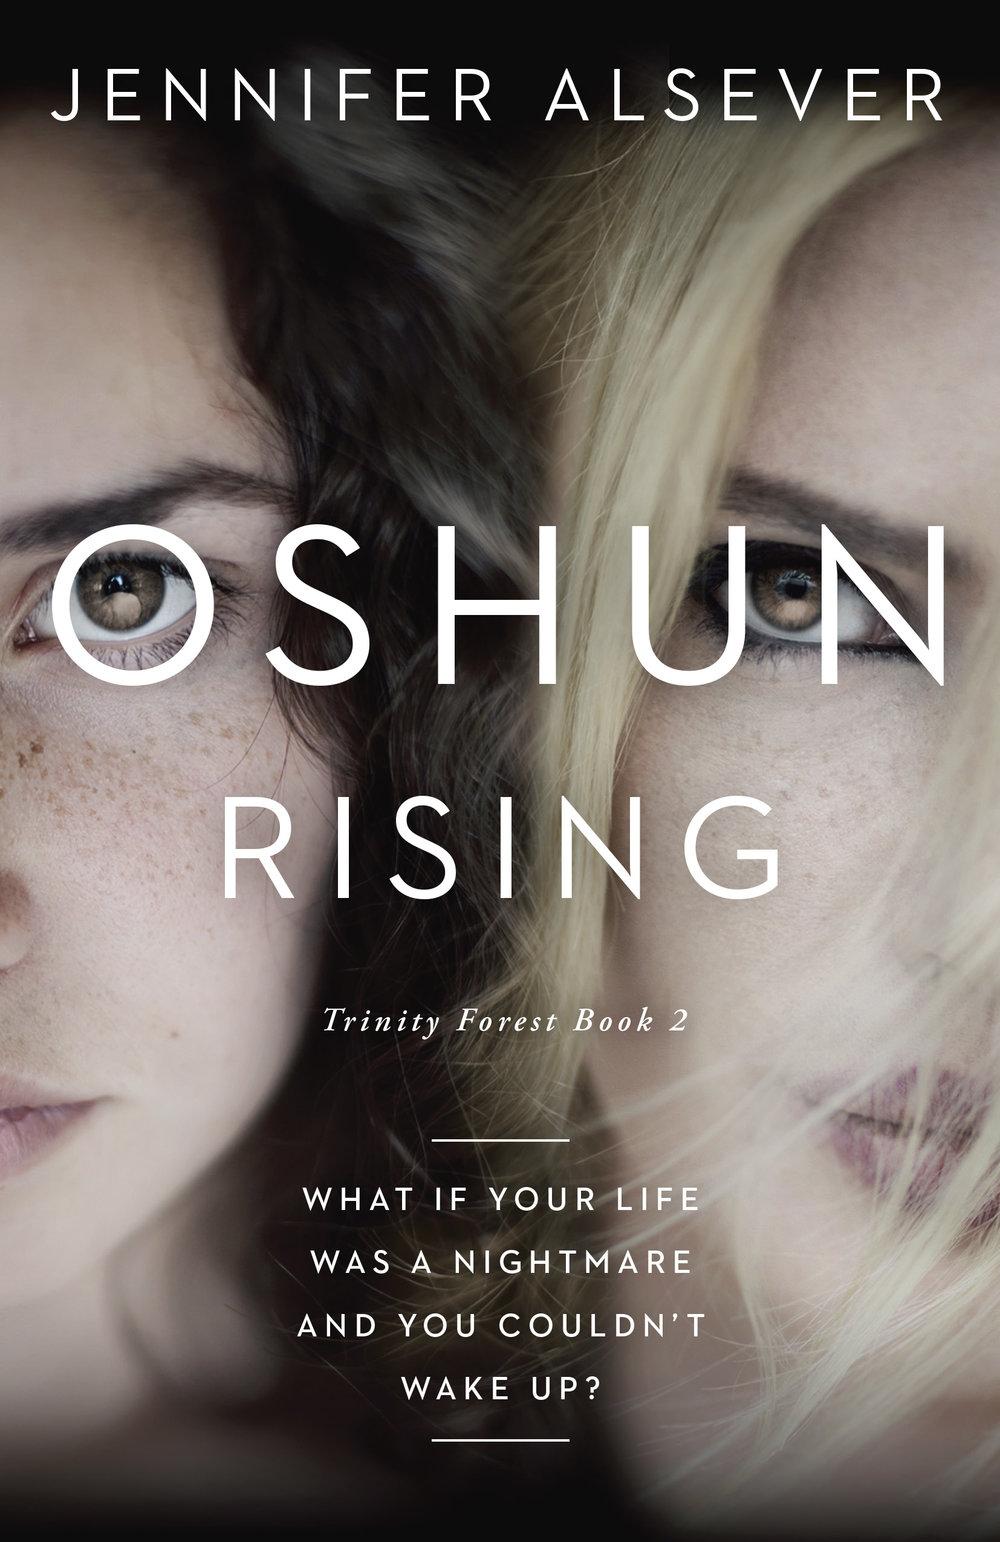 Oshun_Rising_front_cover-6-15.jpg